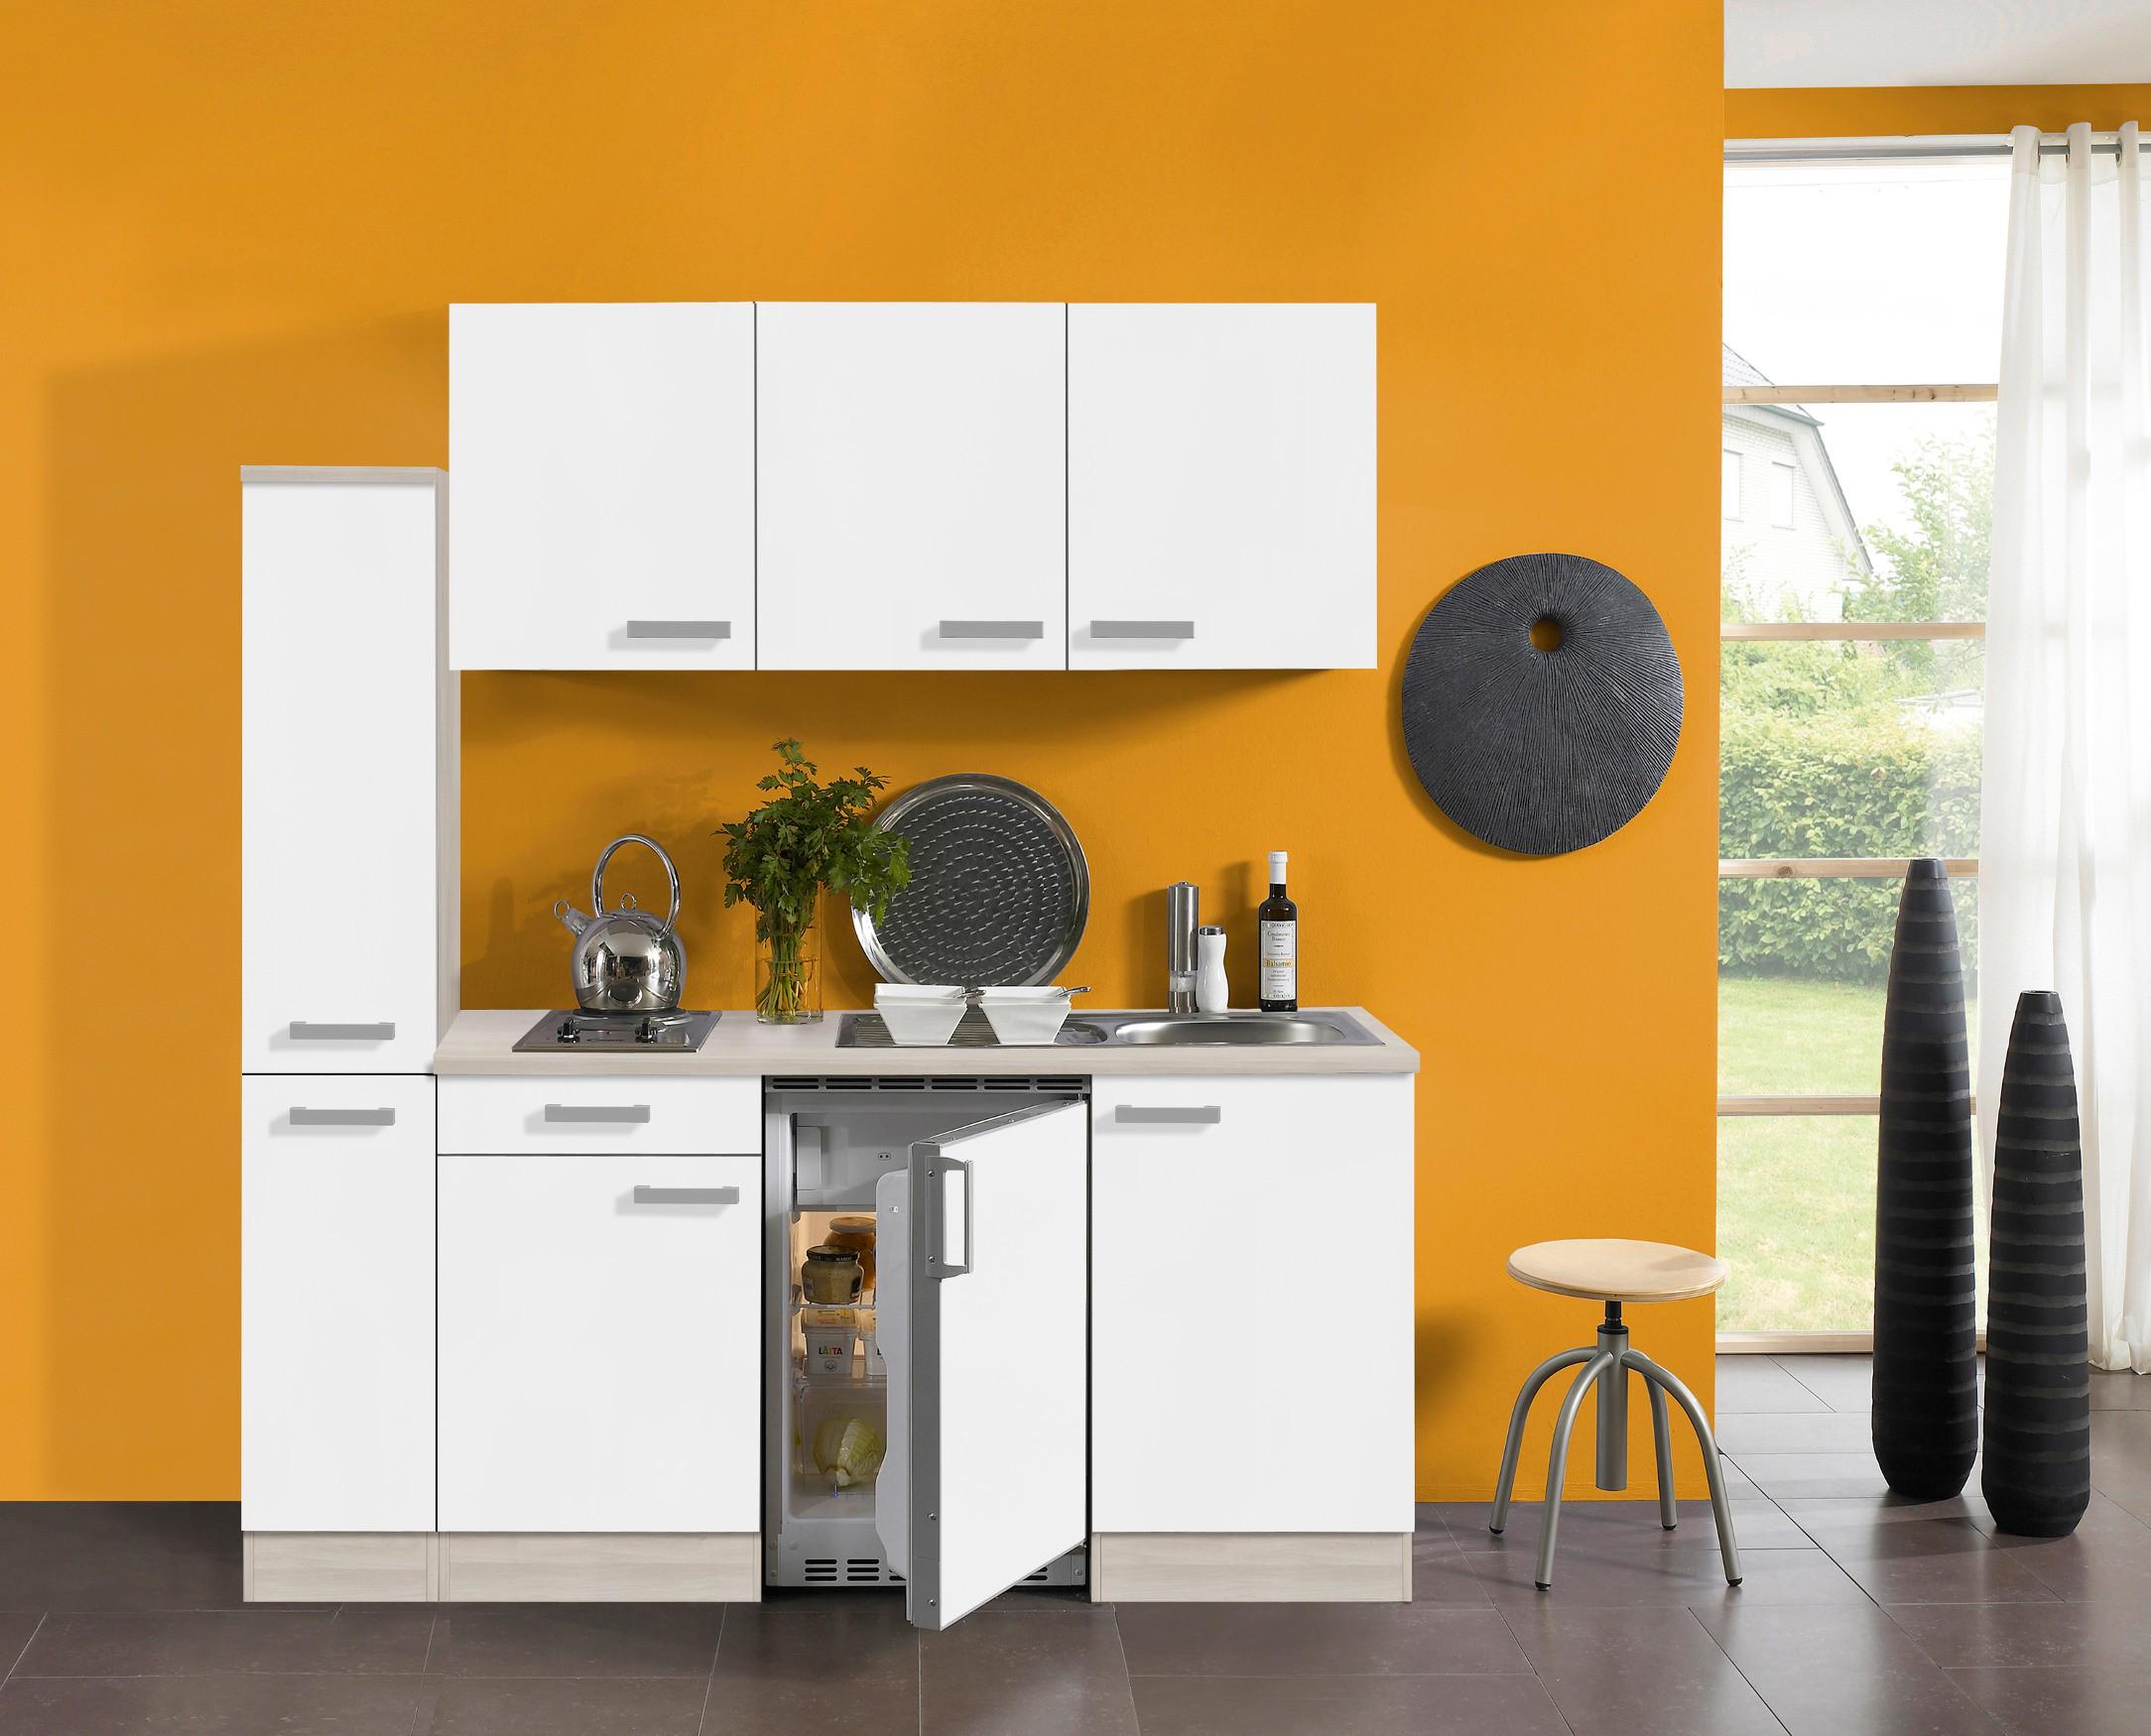 Miniküche Mit Kühlschrank Ohne Kochfeld : Singleküche barcelona mit elektro kochfeld teilig breite